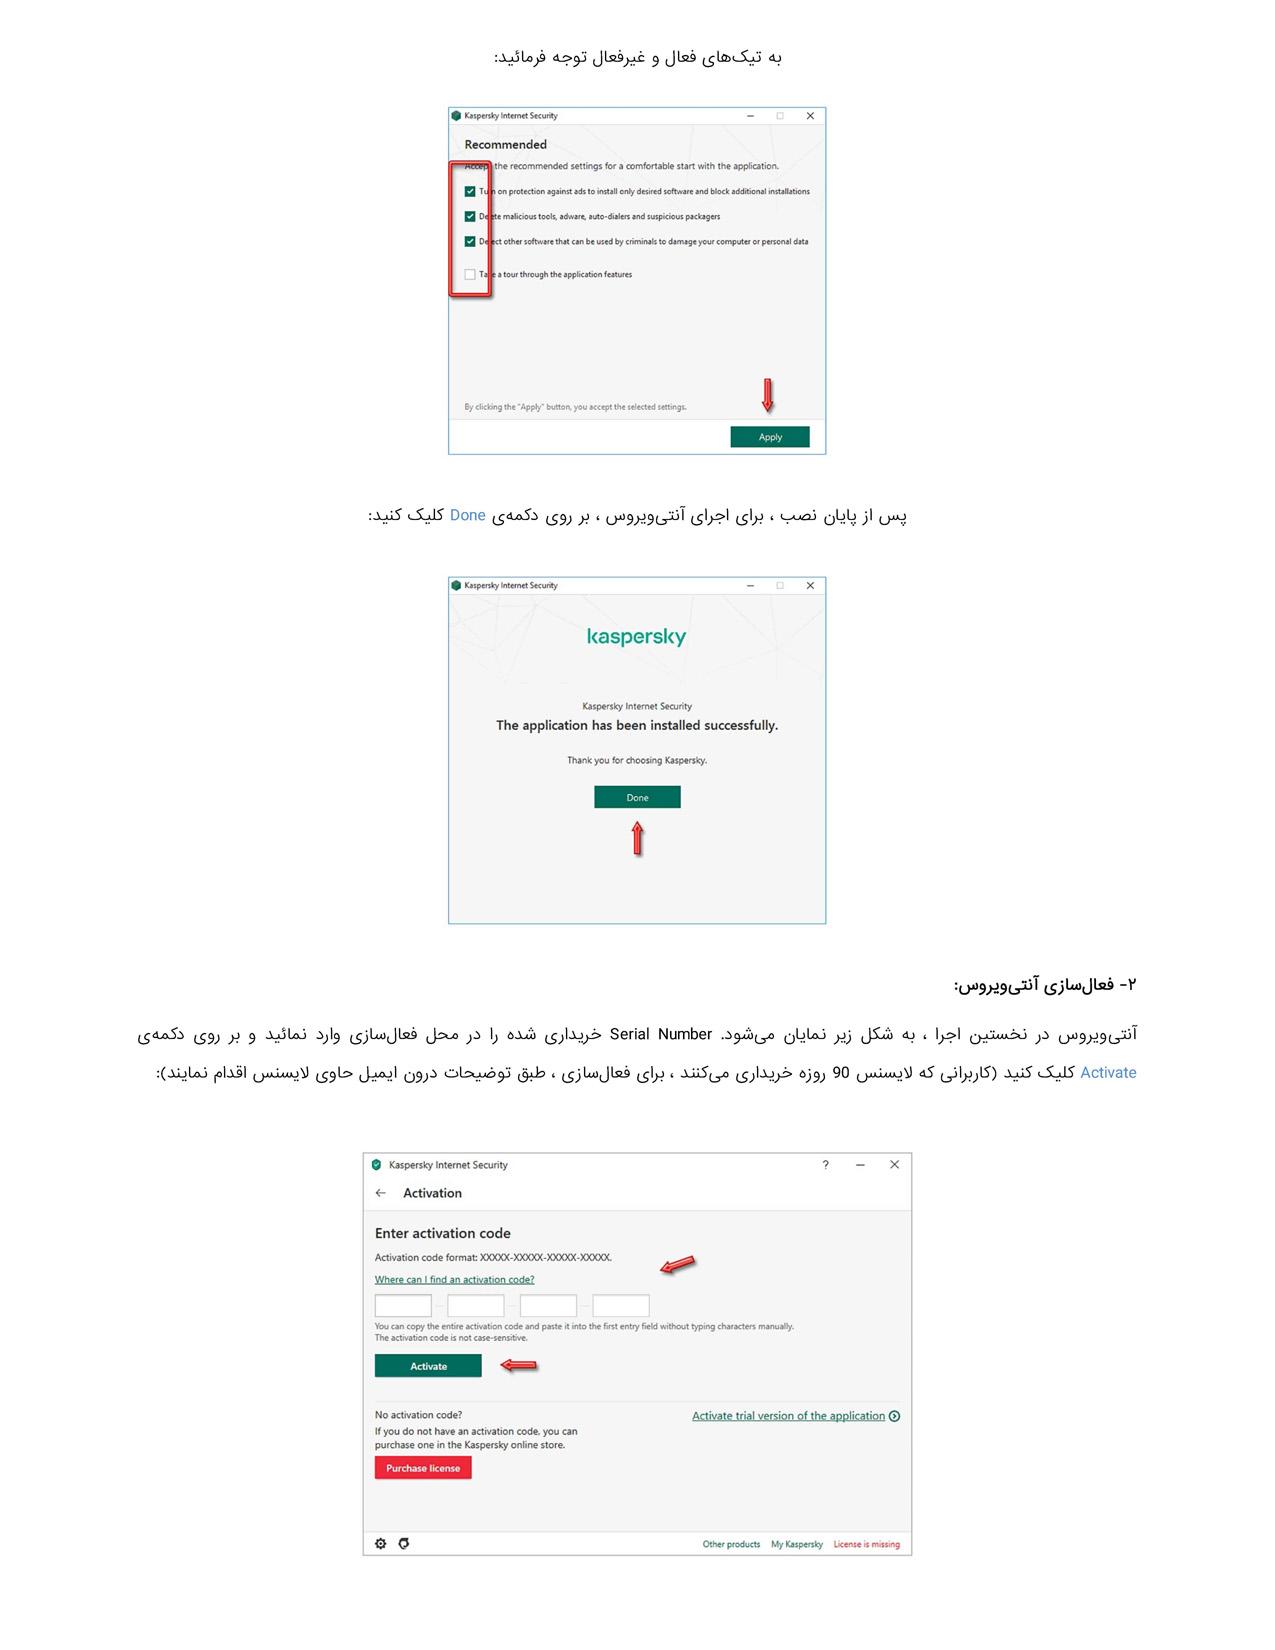 Index of /Security/Magazine/Kaspersky/Installation/